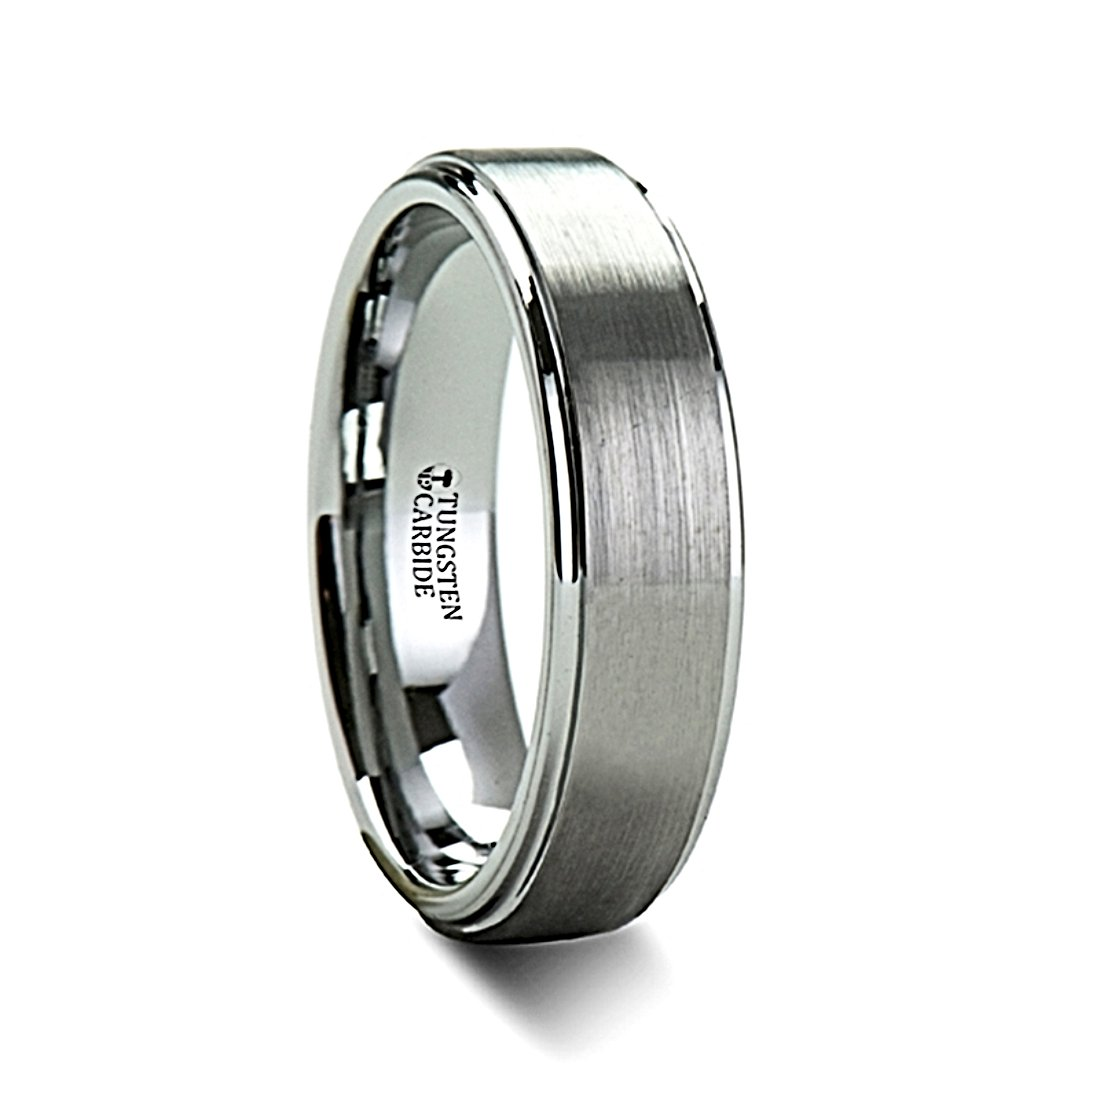 Thorsten Optimus Brush Finish Raised Center Polished Edge Tungsten Ring 4mm Wide Wedding Band from Roy Rose Jewelry